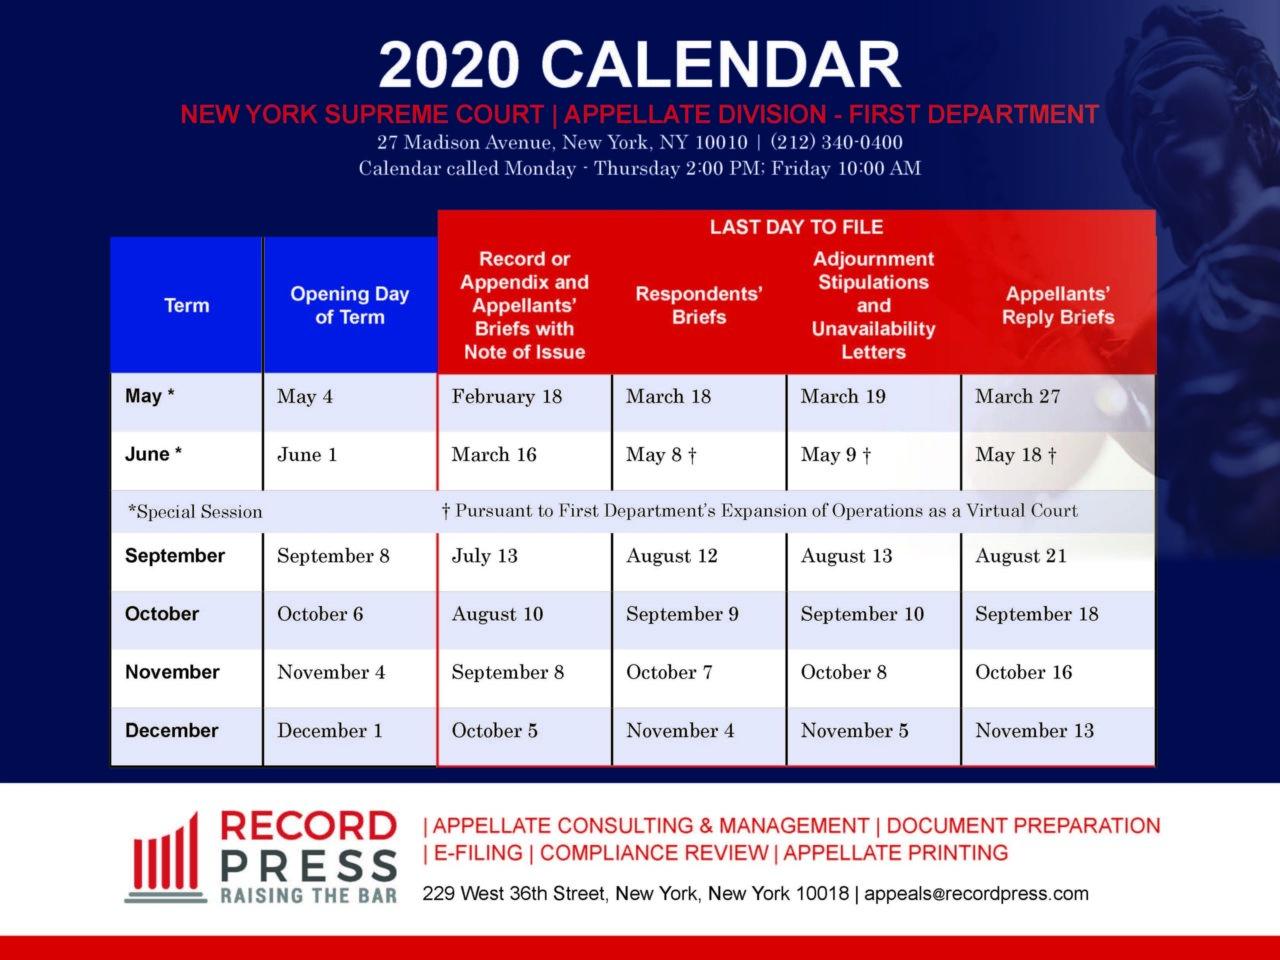 RecordPress_2020_CalendarV1_Page_1-3